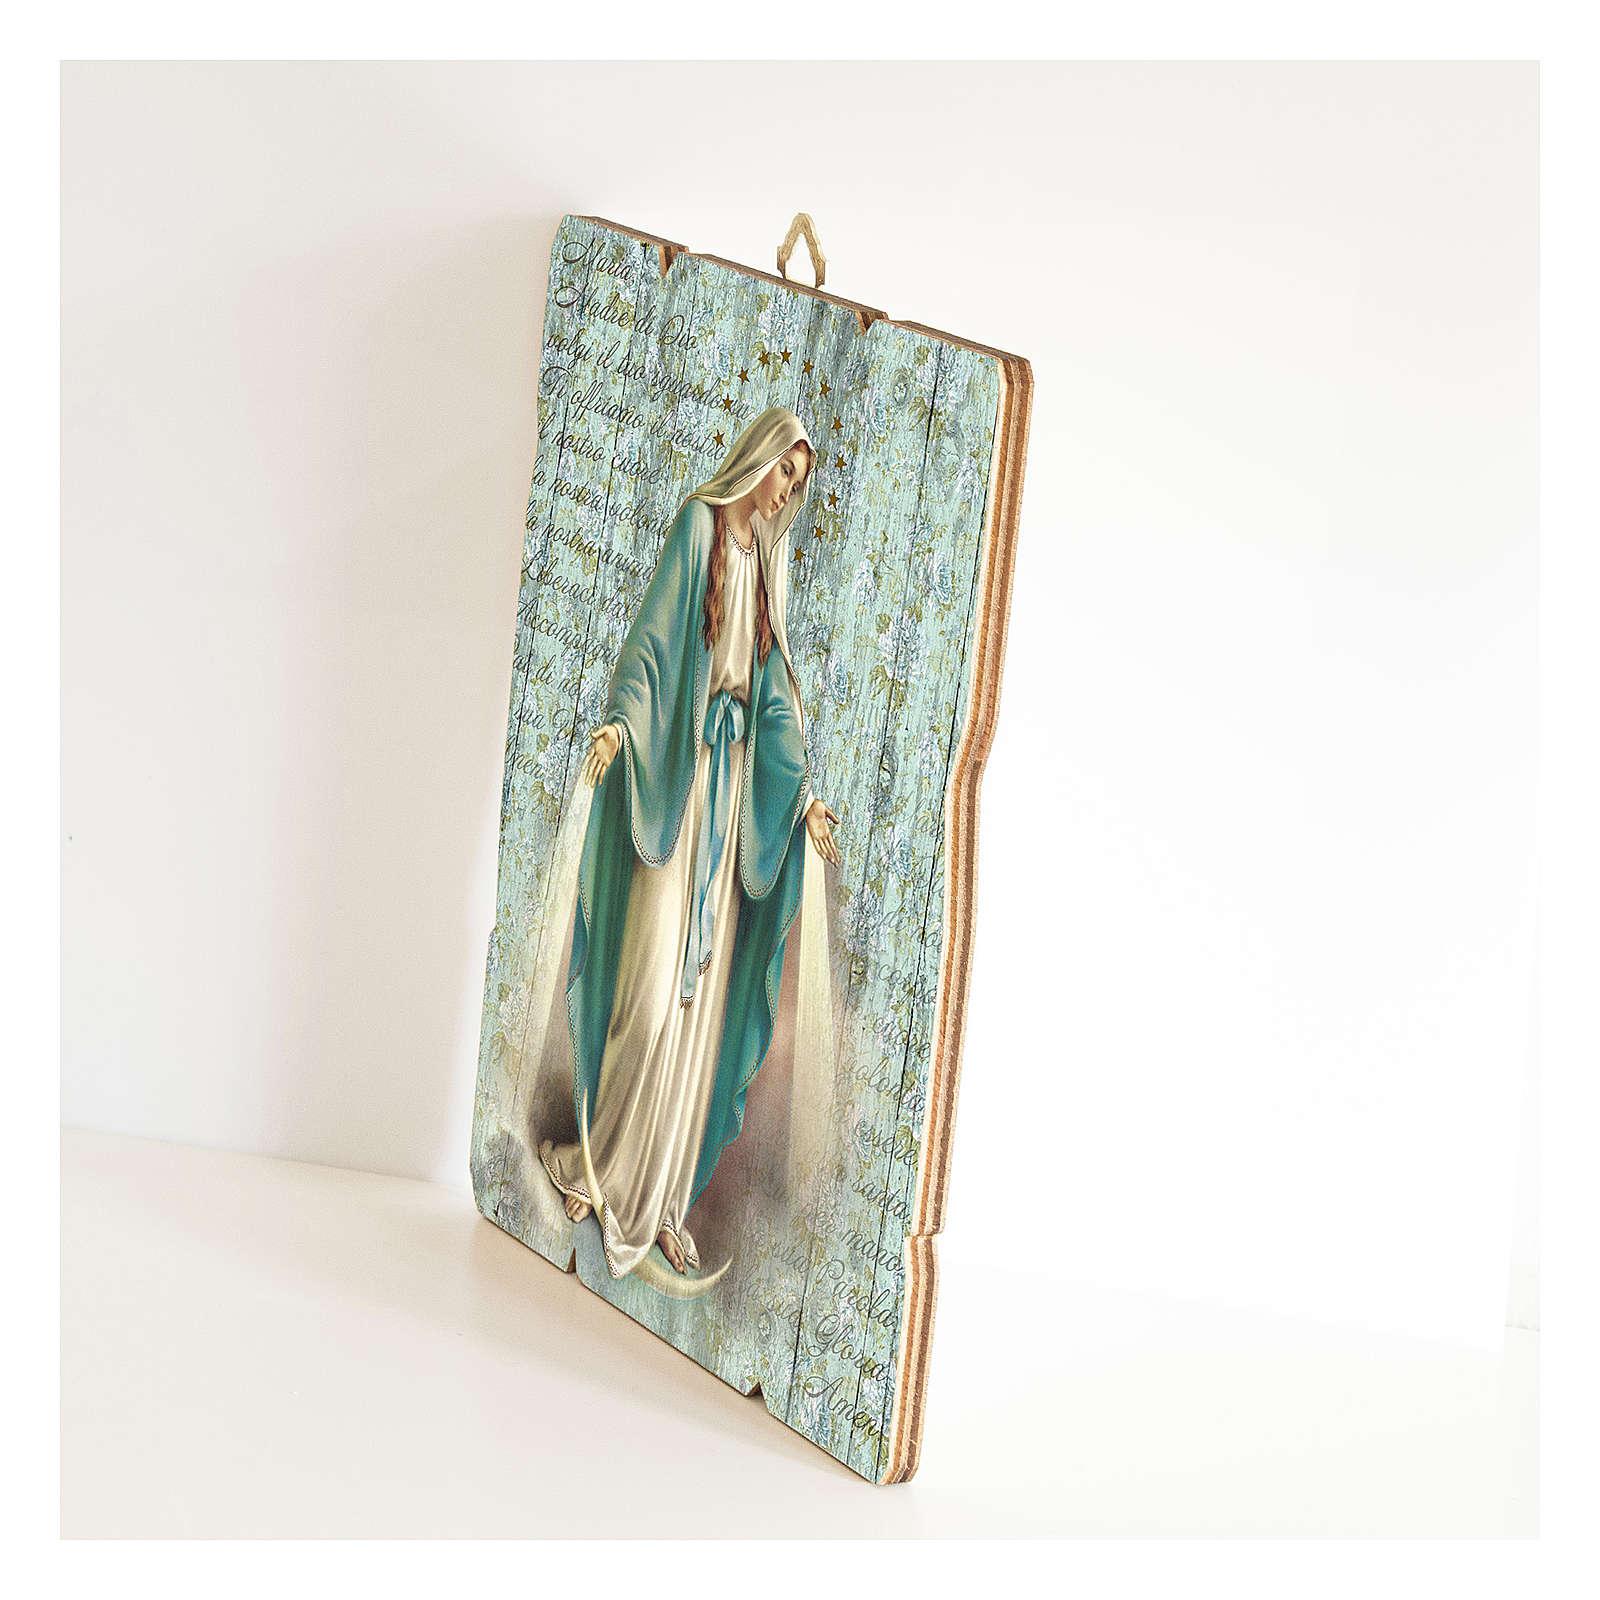 Cuadro madera perfilada gancho parte posterior Virgen Milagrosa 3